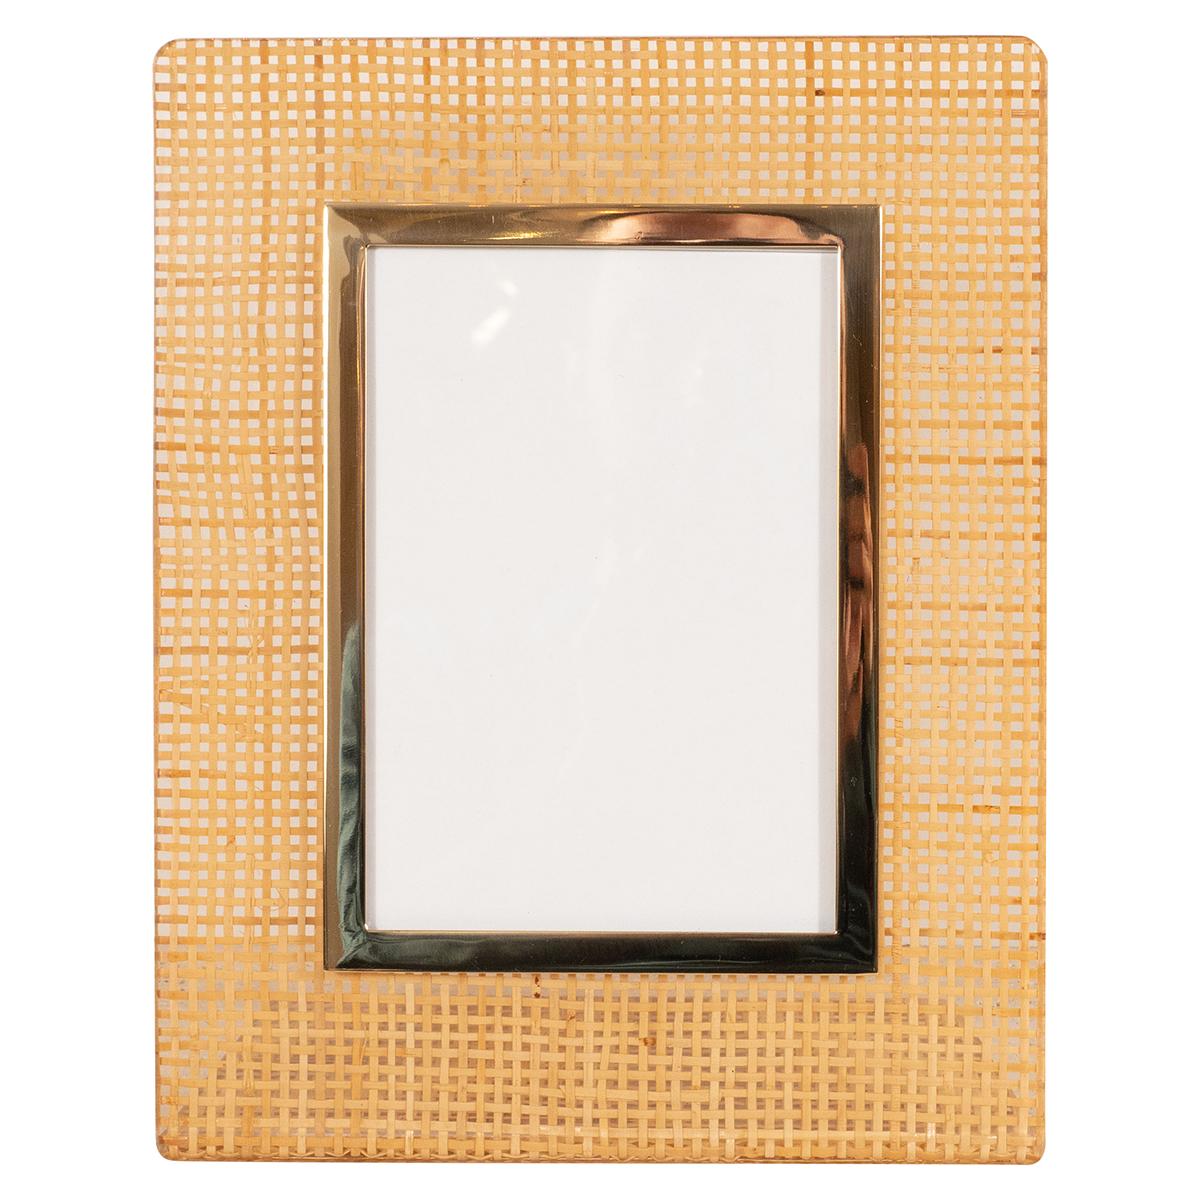 Lucite and rattan picture frame | Picture Frames | John Salibello